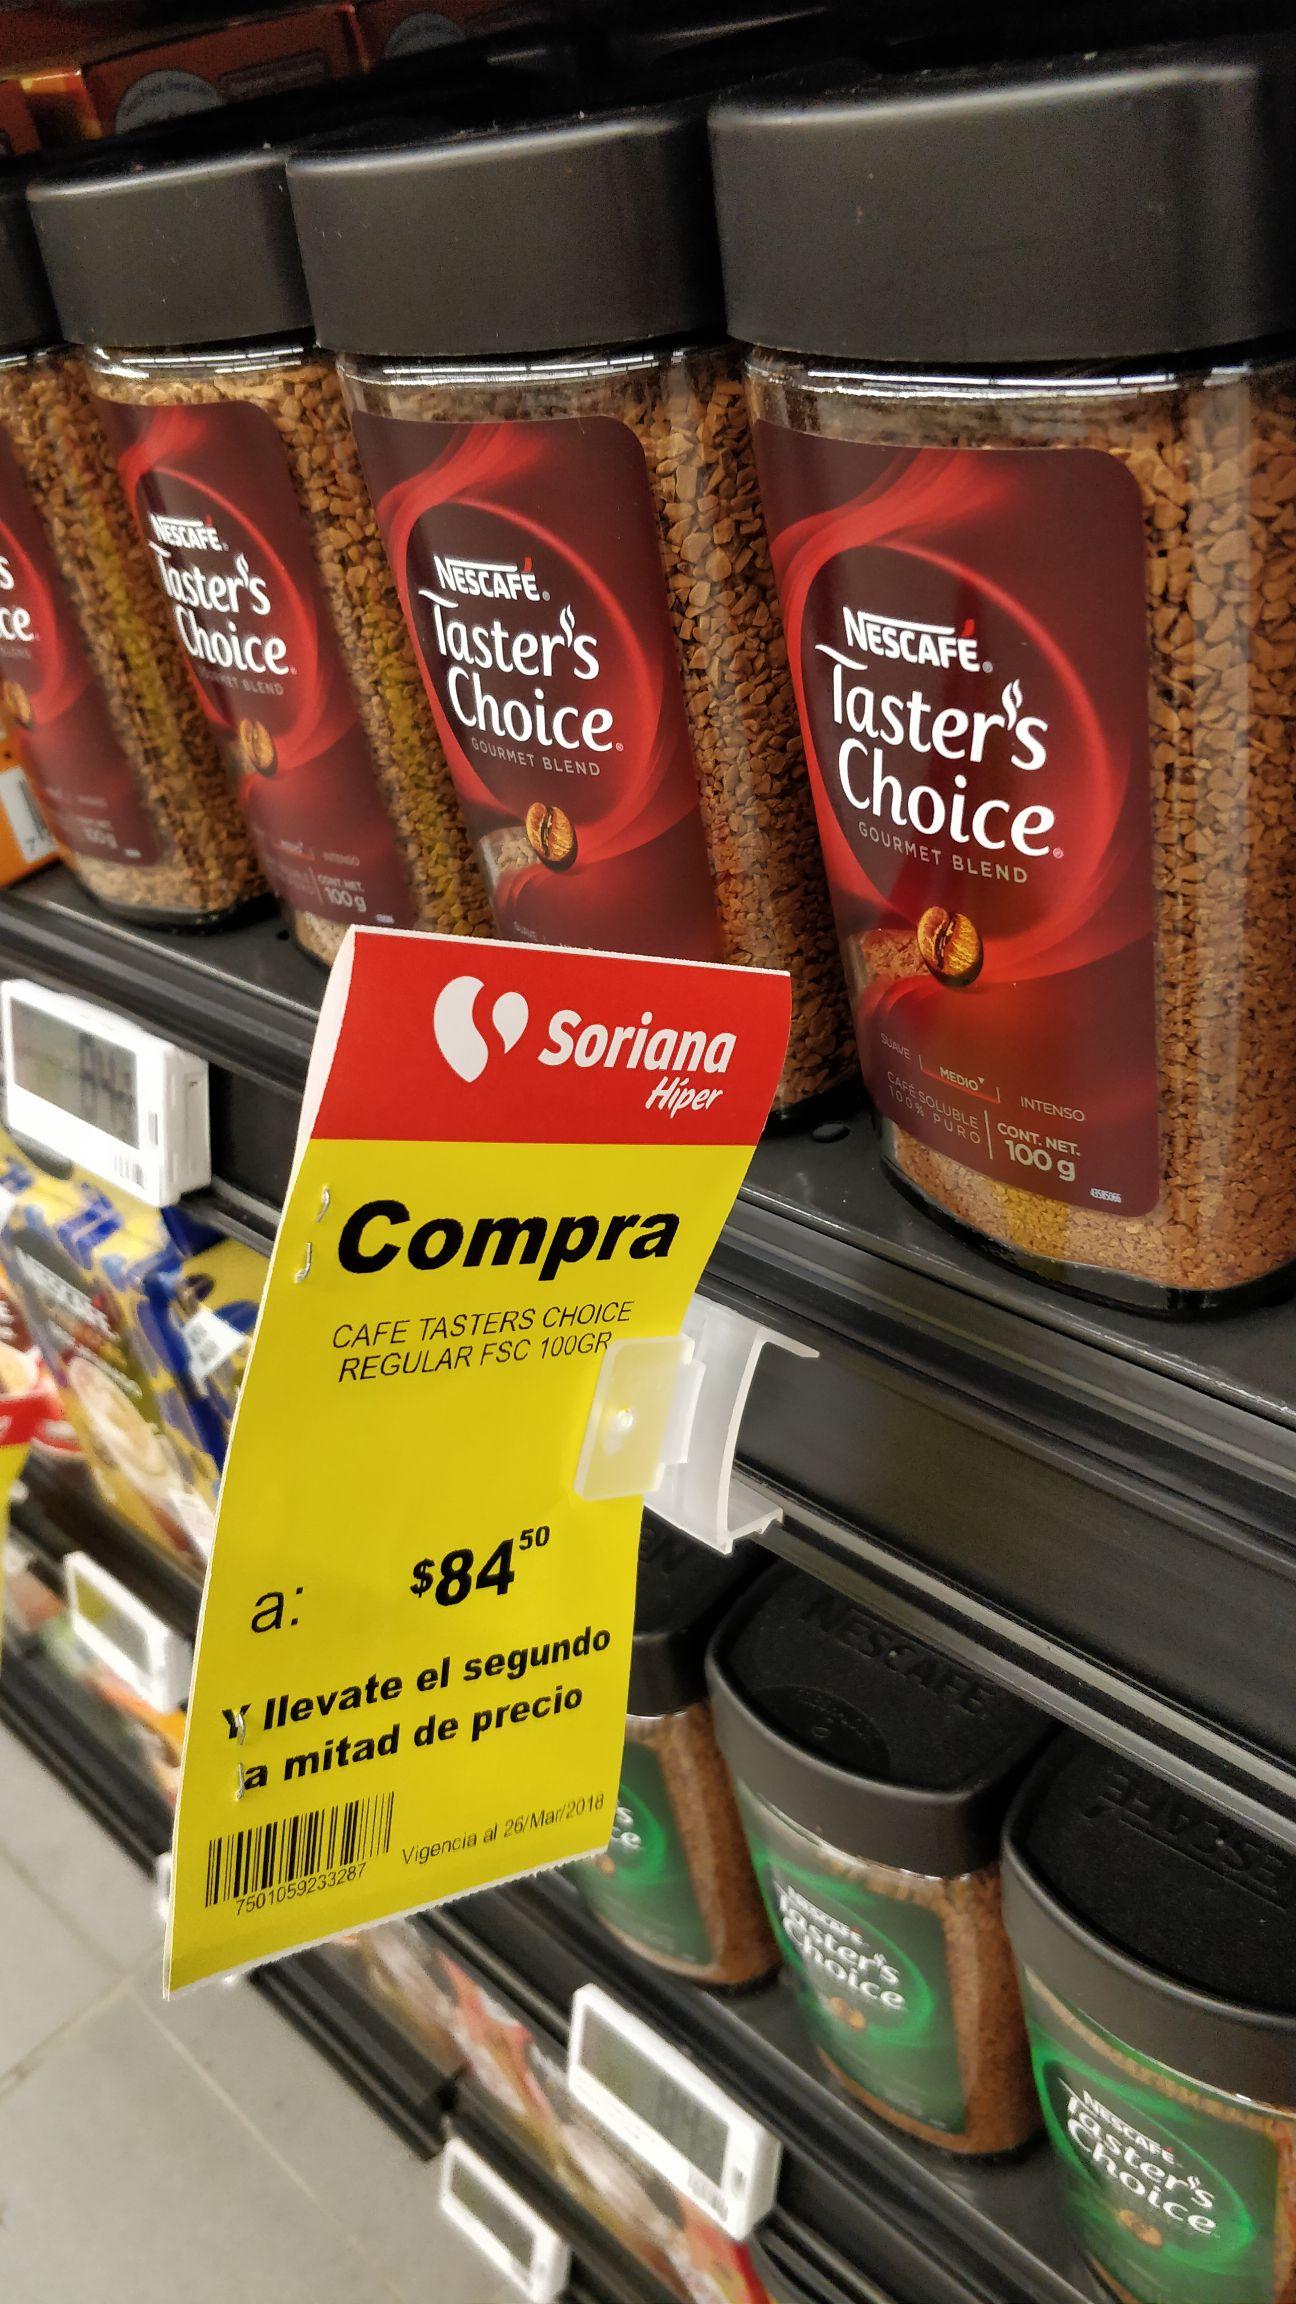 SORIANA: Café Taster's Choice 100g $84.50 (2x $126.75)